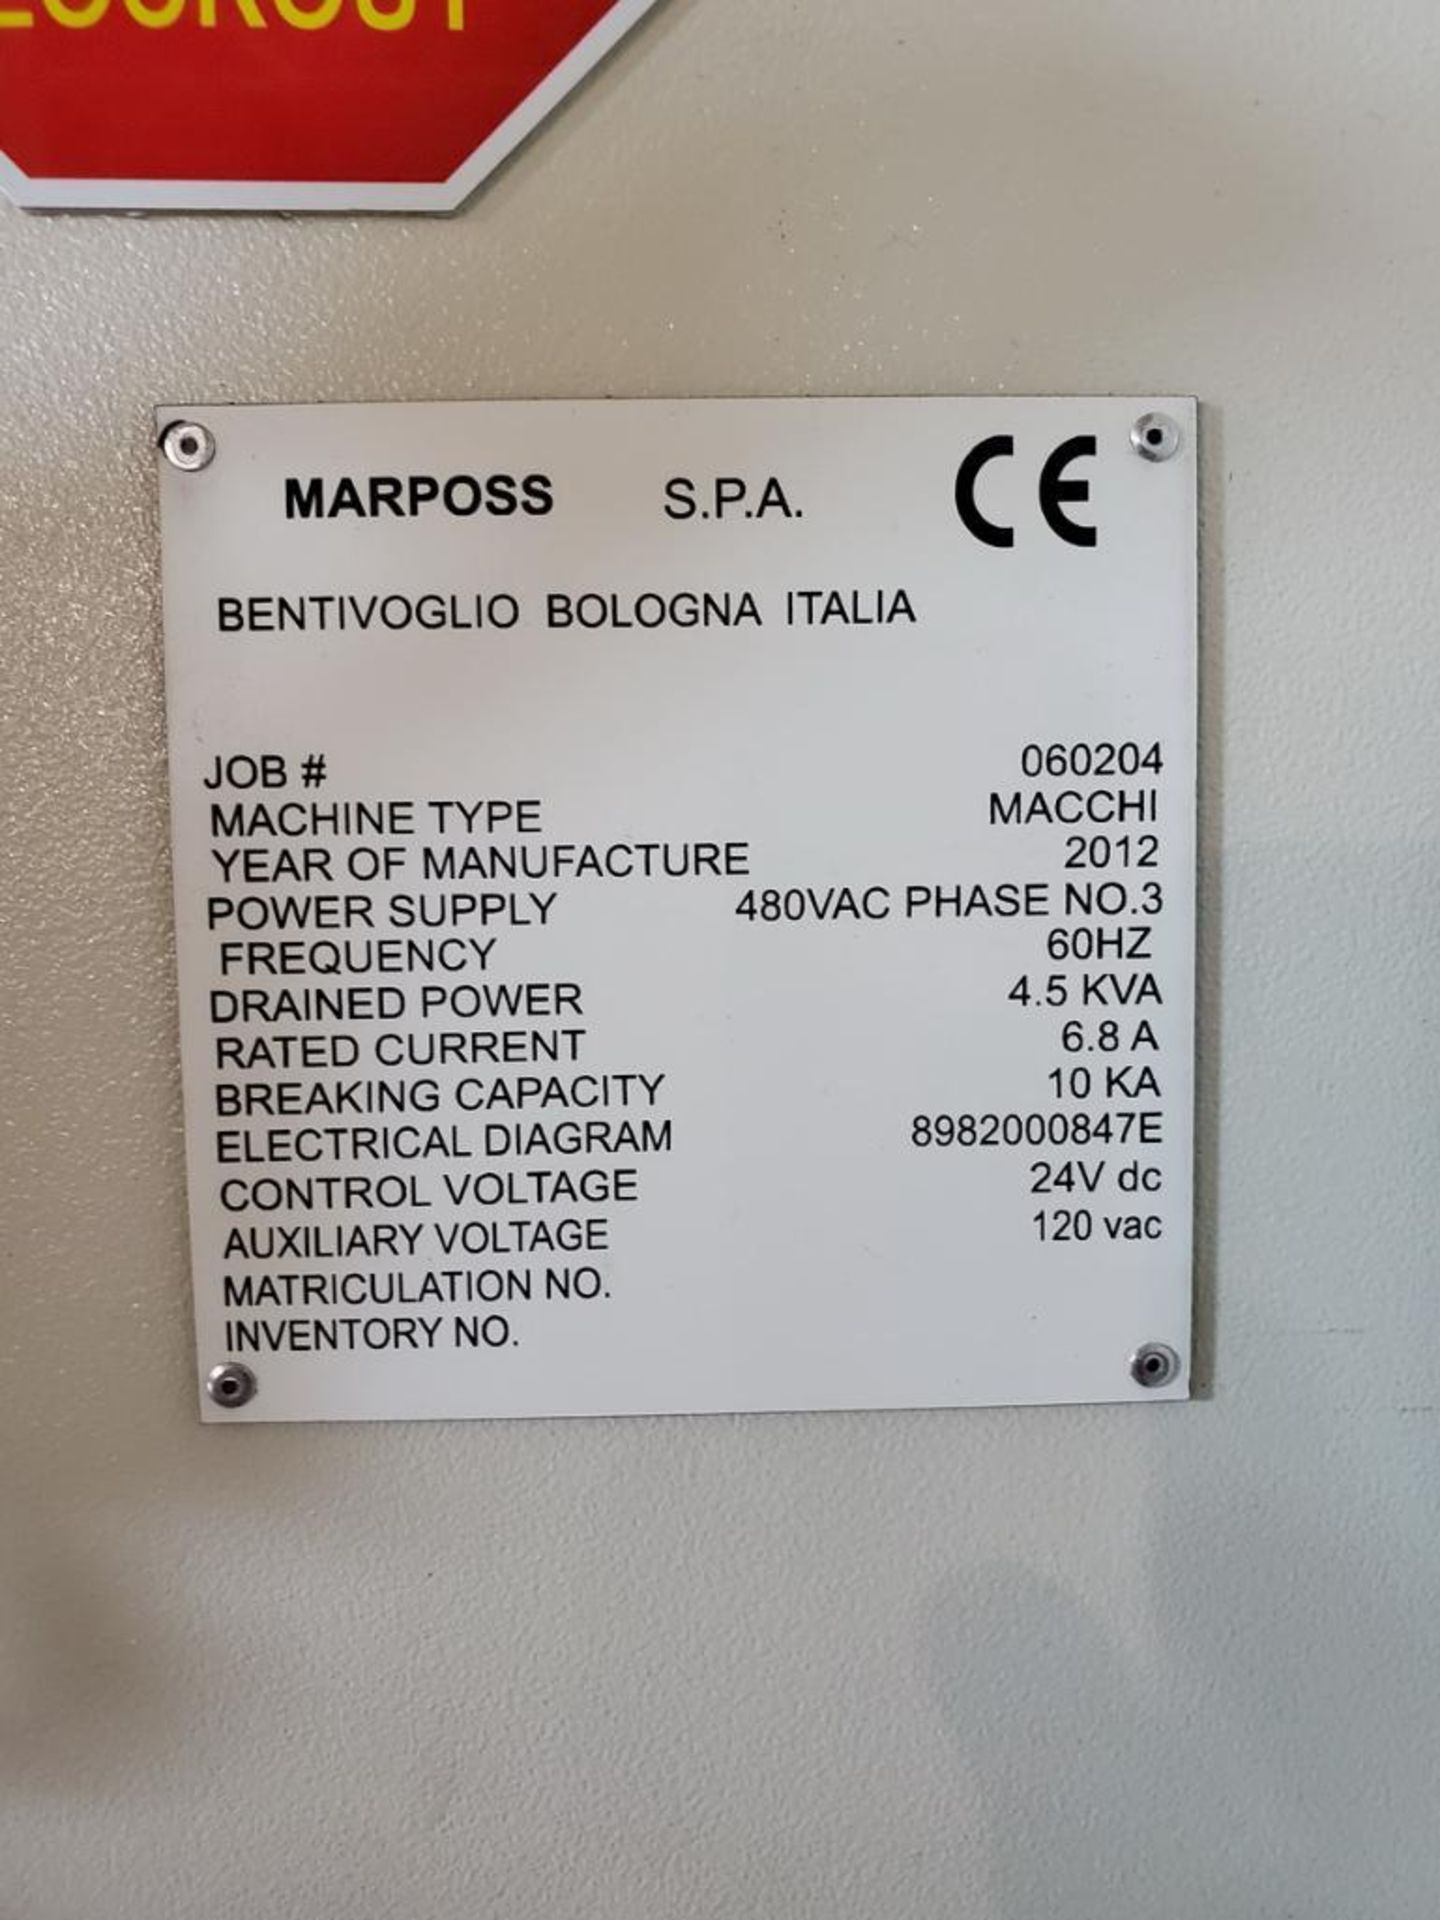 Lot 14 - 20112 Marposs Macchi